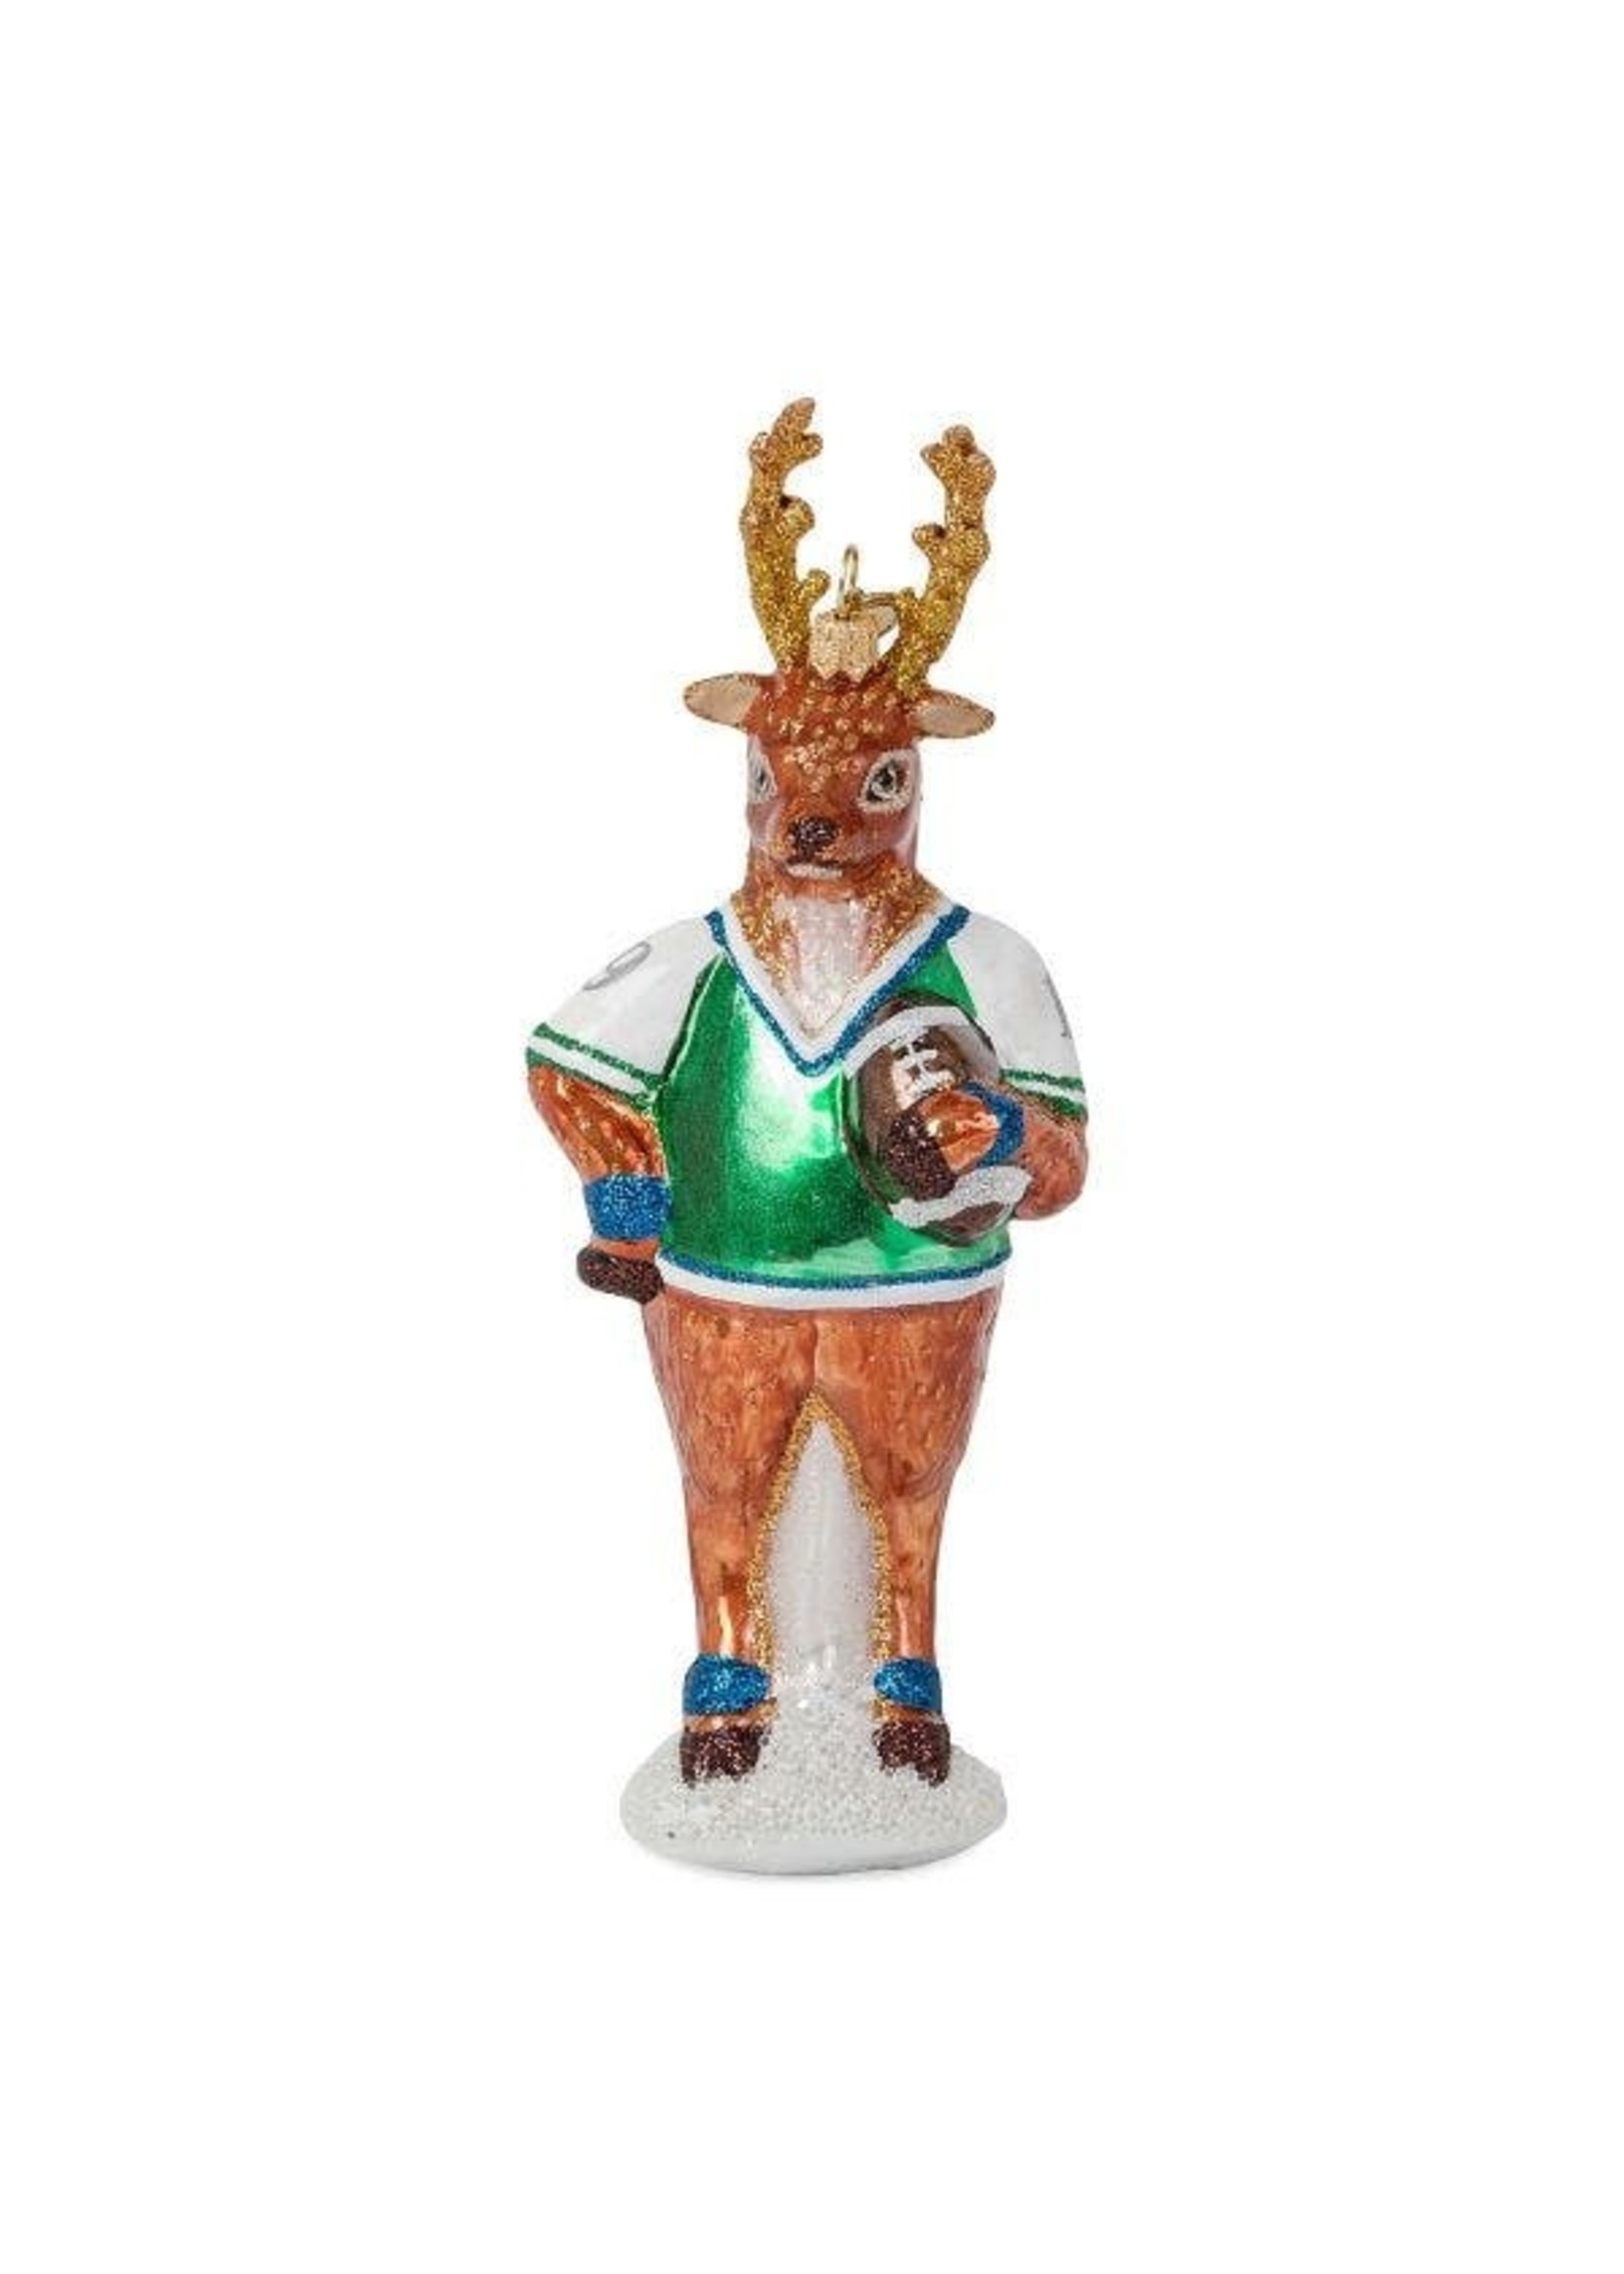 Juliska Ornament - Blitzen the Reindeer